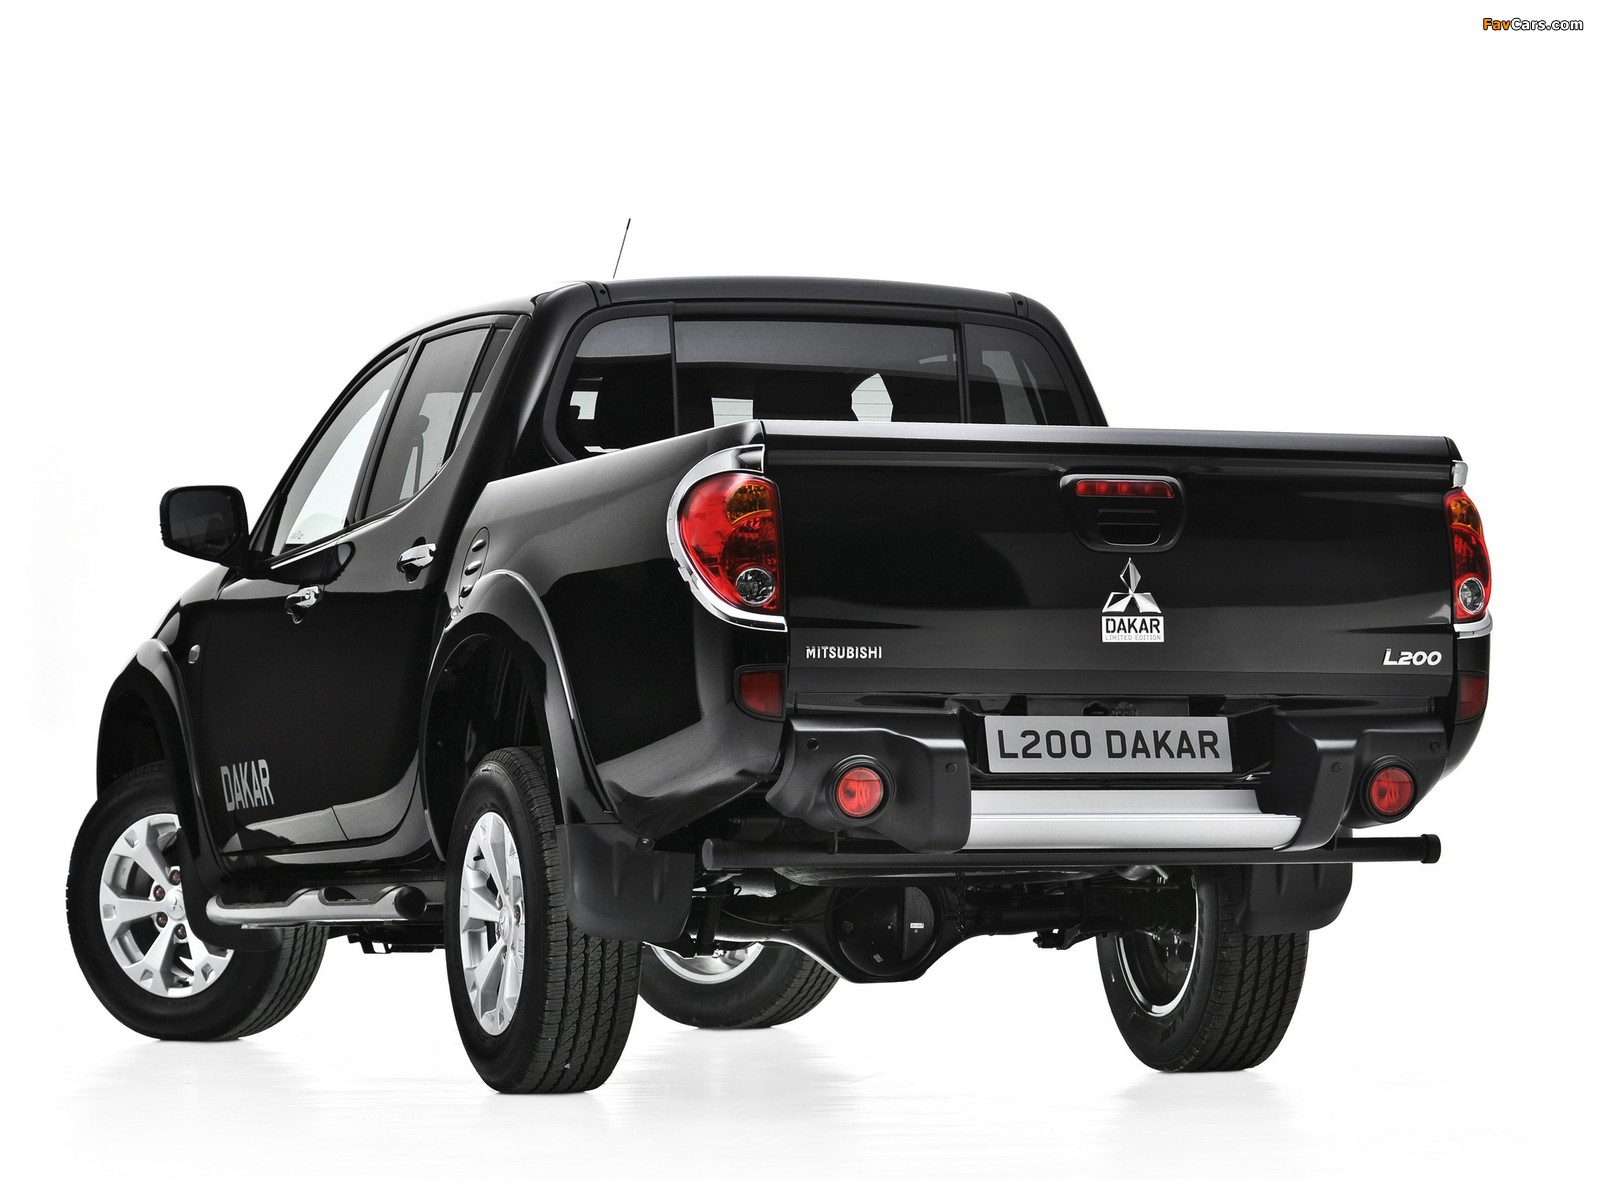 Mitsubishi L200 Dakar 2012 images (1600 x 1200)